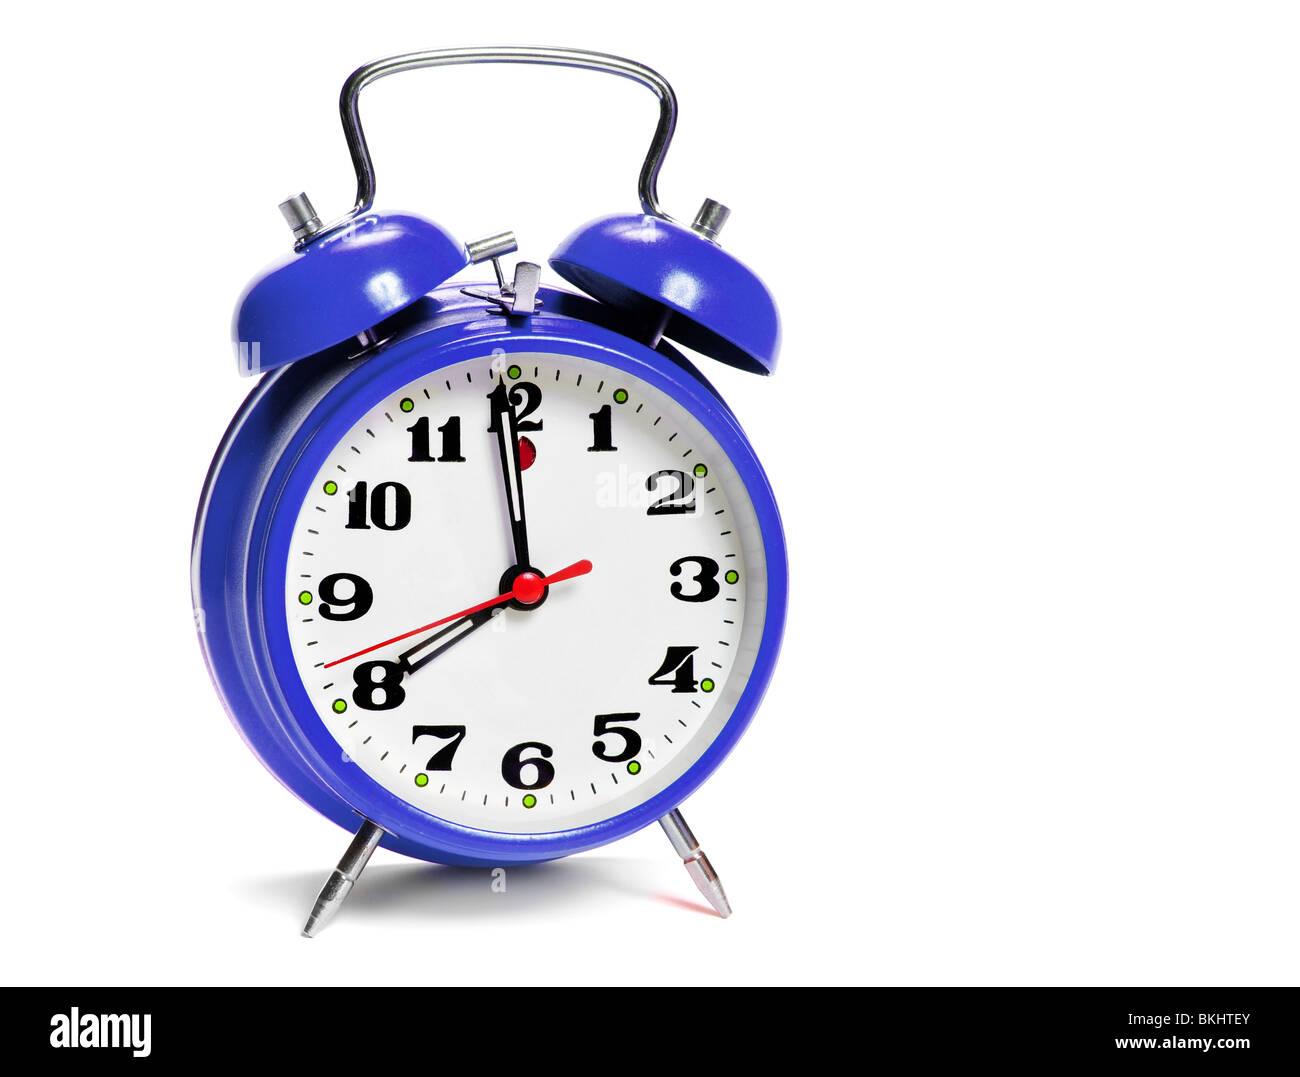 vintage alarm clock isolated on white - Stock Image